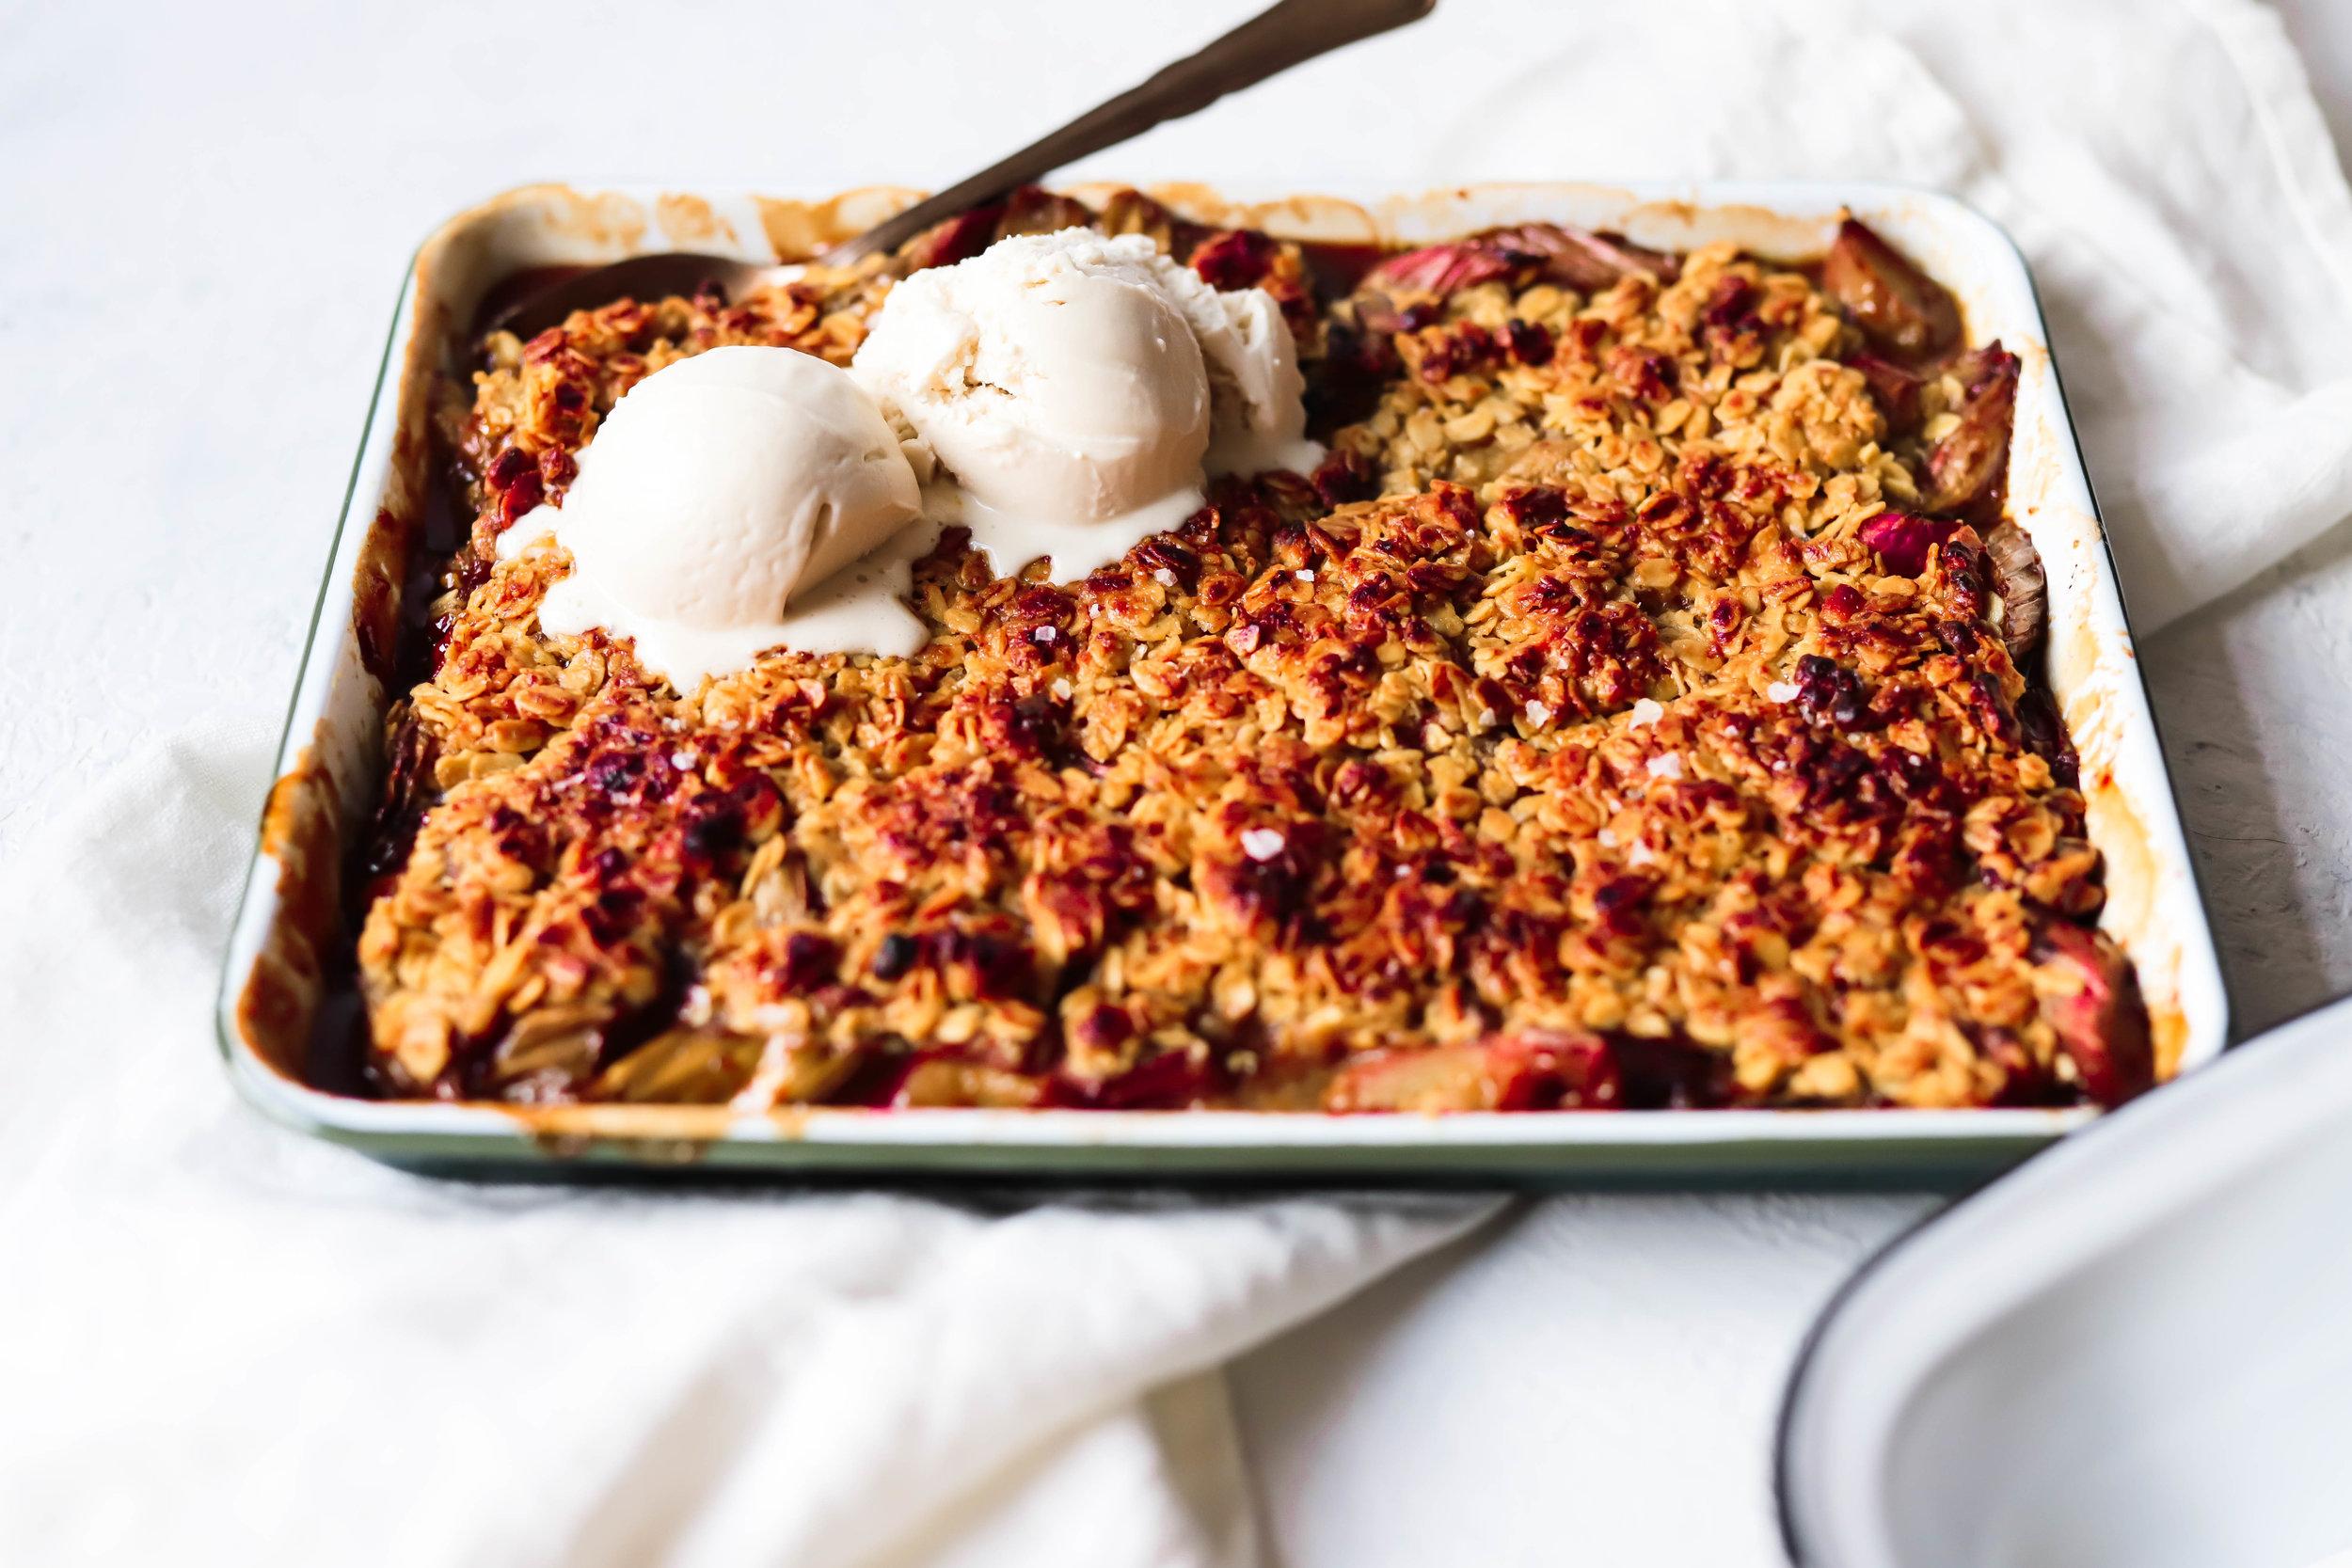 vegan and gluten-free rhubarb crisp with ice-cream on top